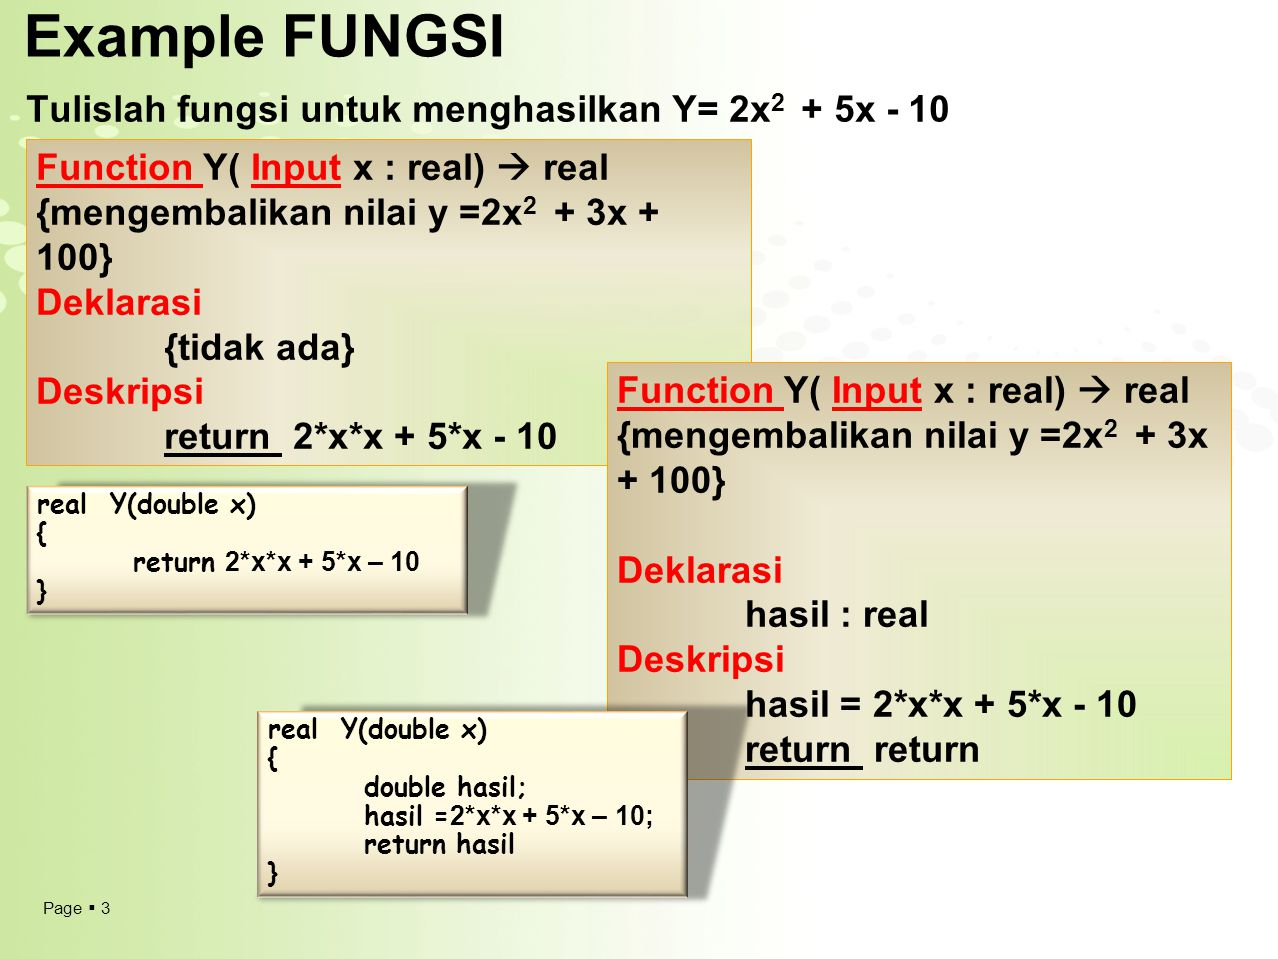 Example FUNGSI Tulislah fungsi untuk menghasilkan Y= 2x2 + 5x - 10